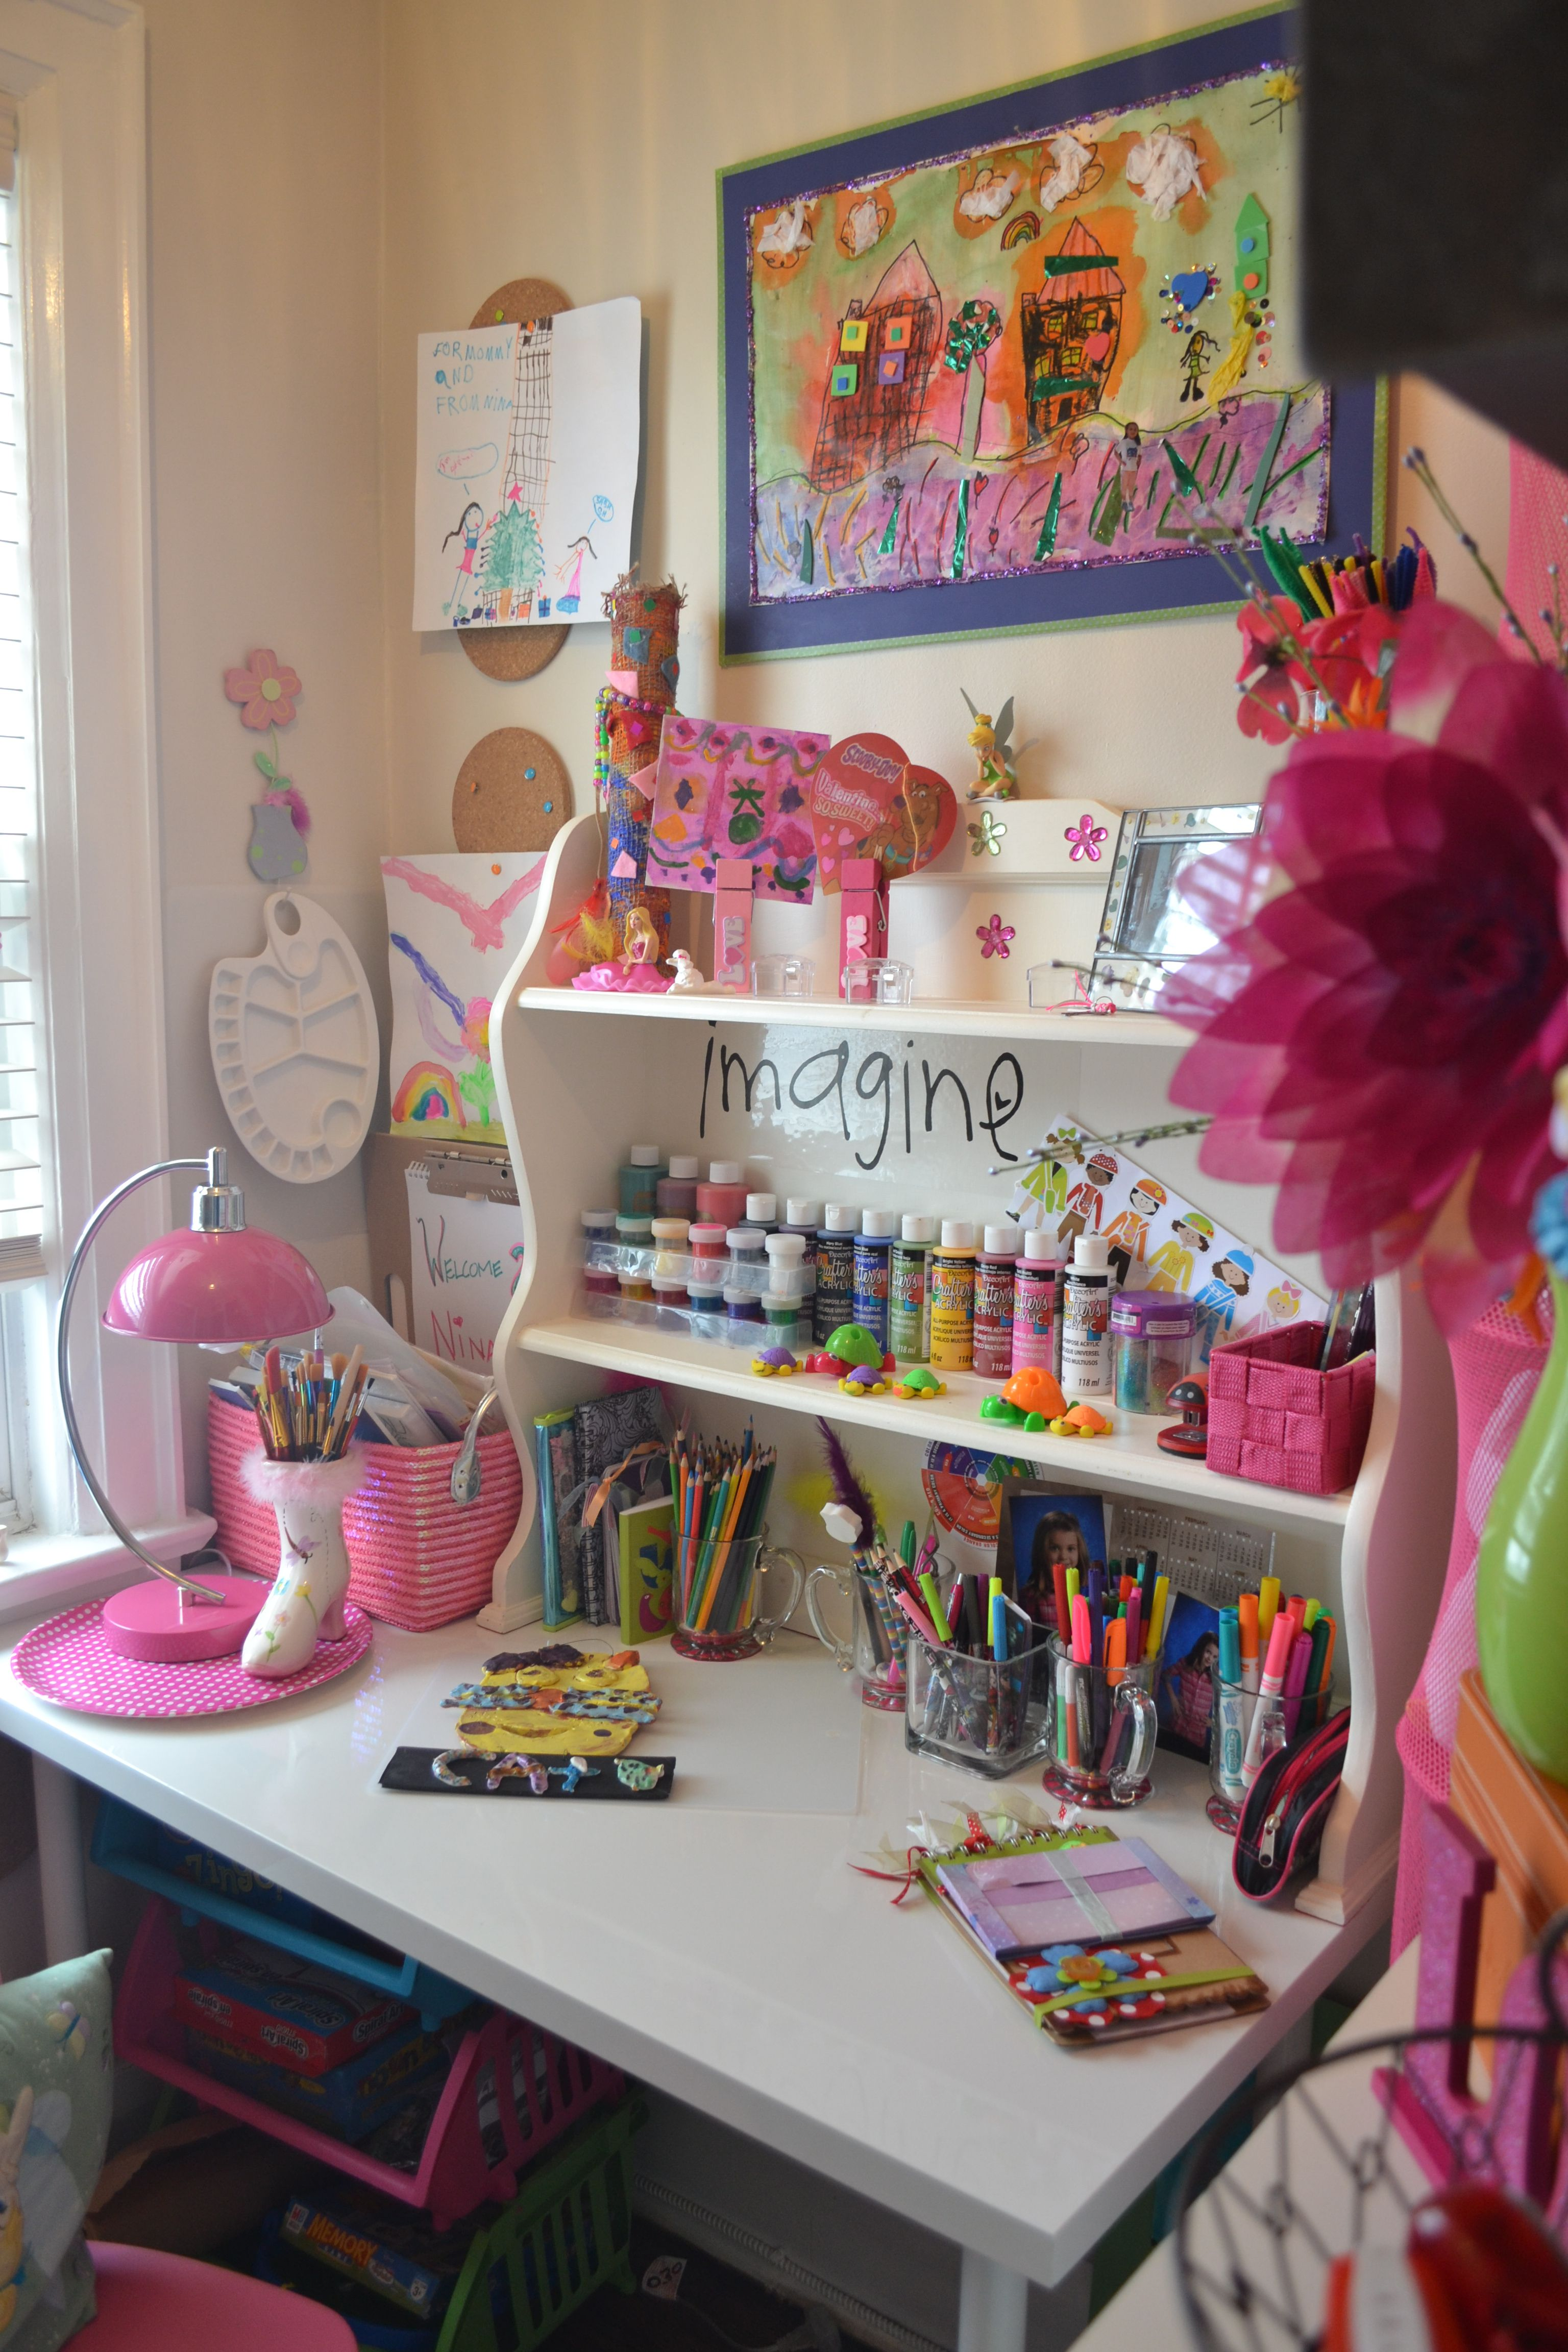 Art Studio 2 Craft Room Craft Corner Creative Space Arts and crafts room